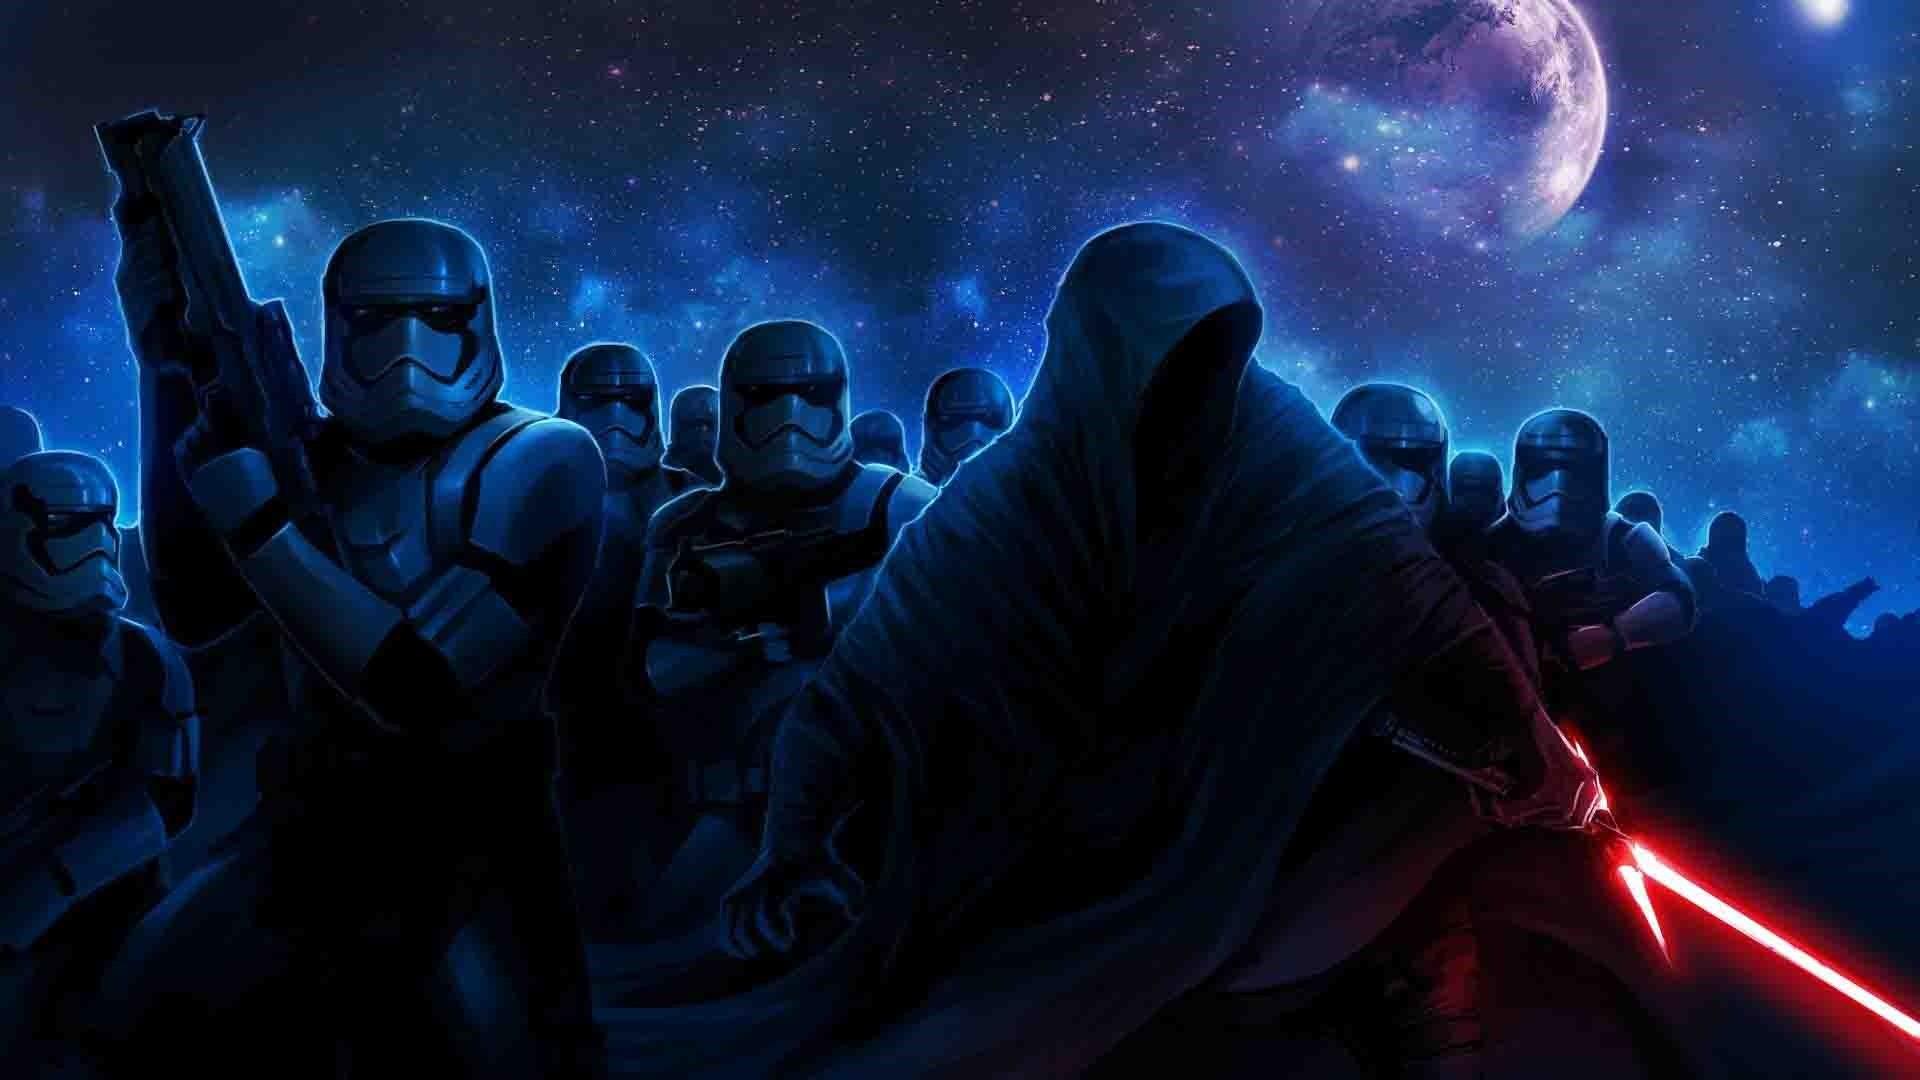 Sith New Wallpaper